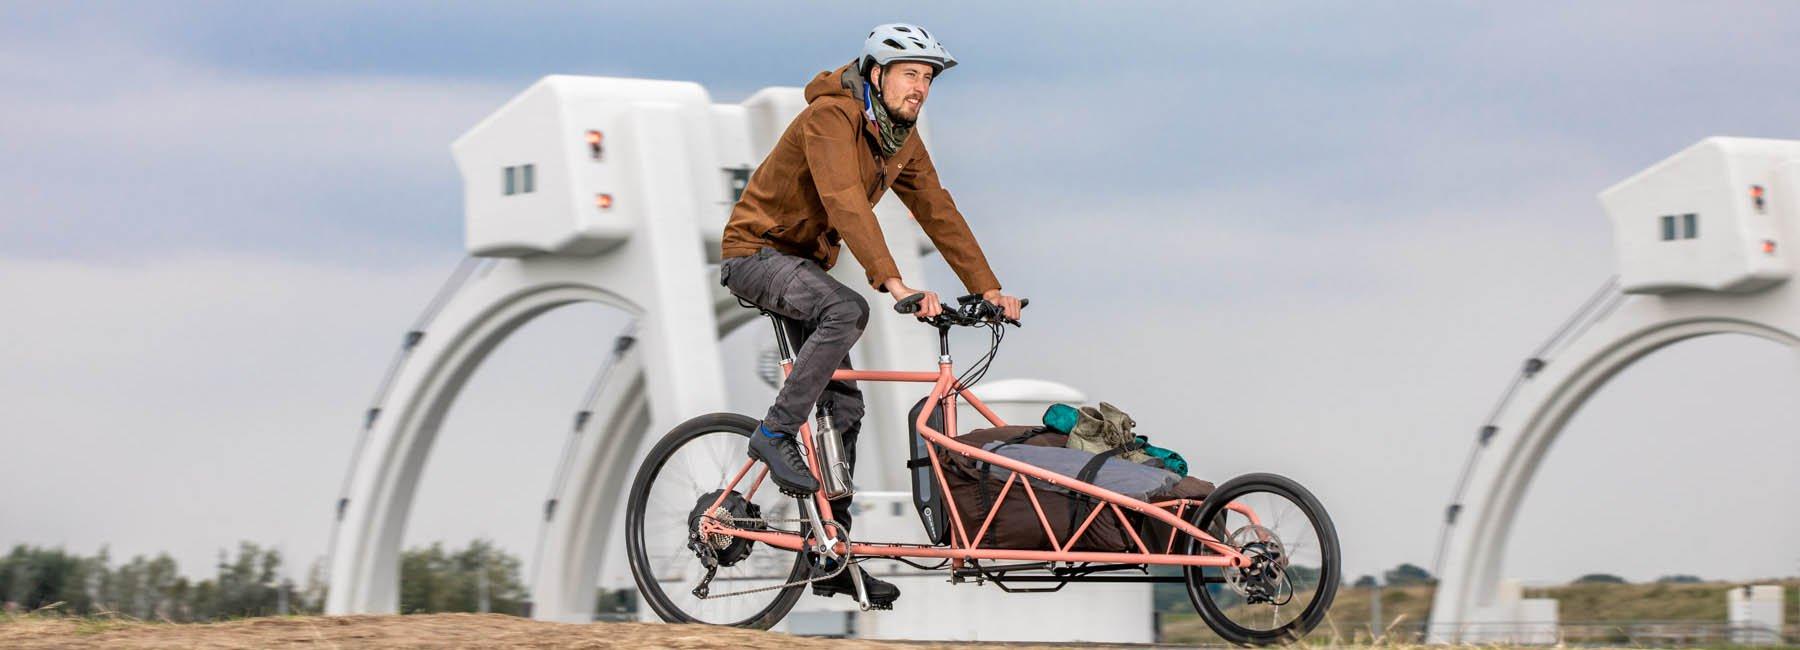 Cycling clipart go ahead. Bike design designboom com